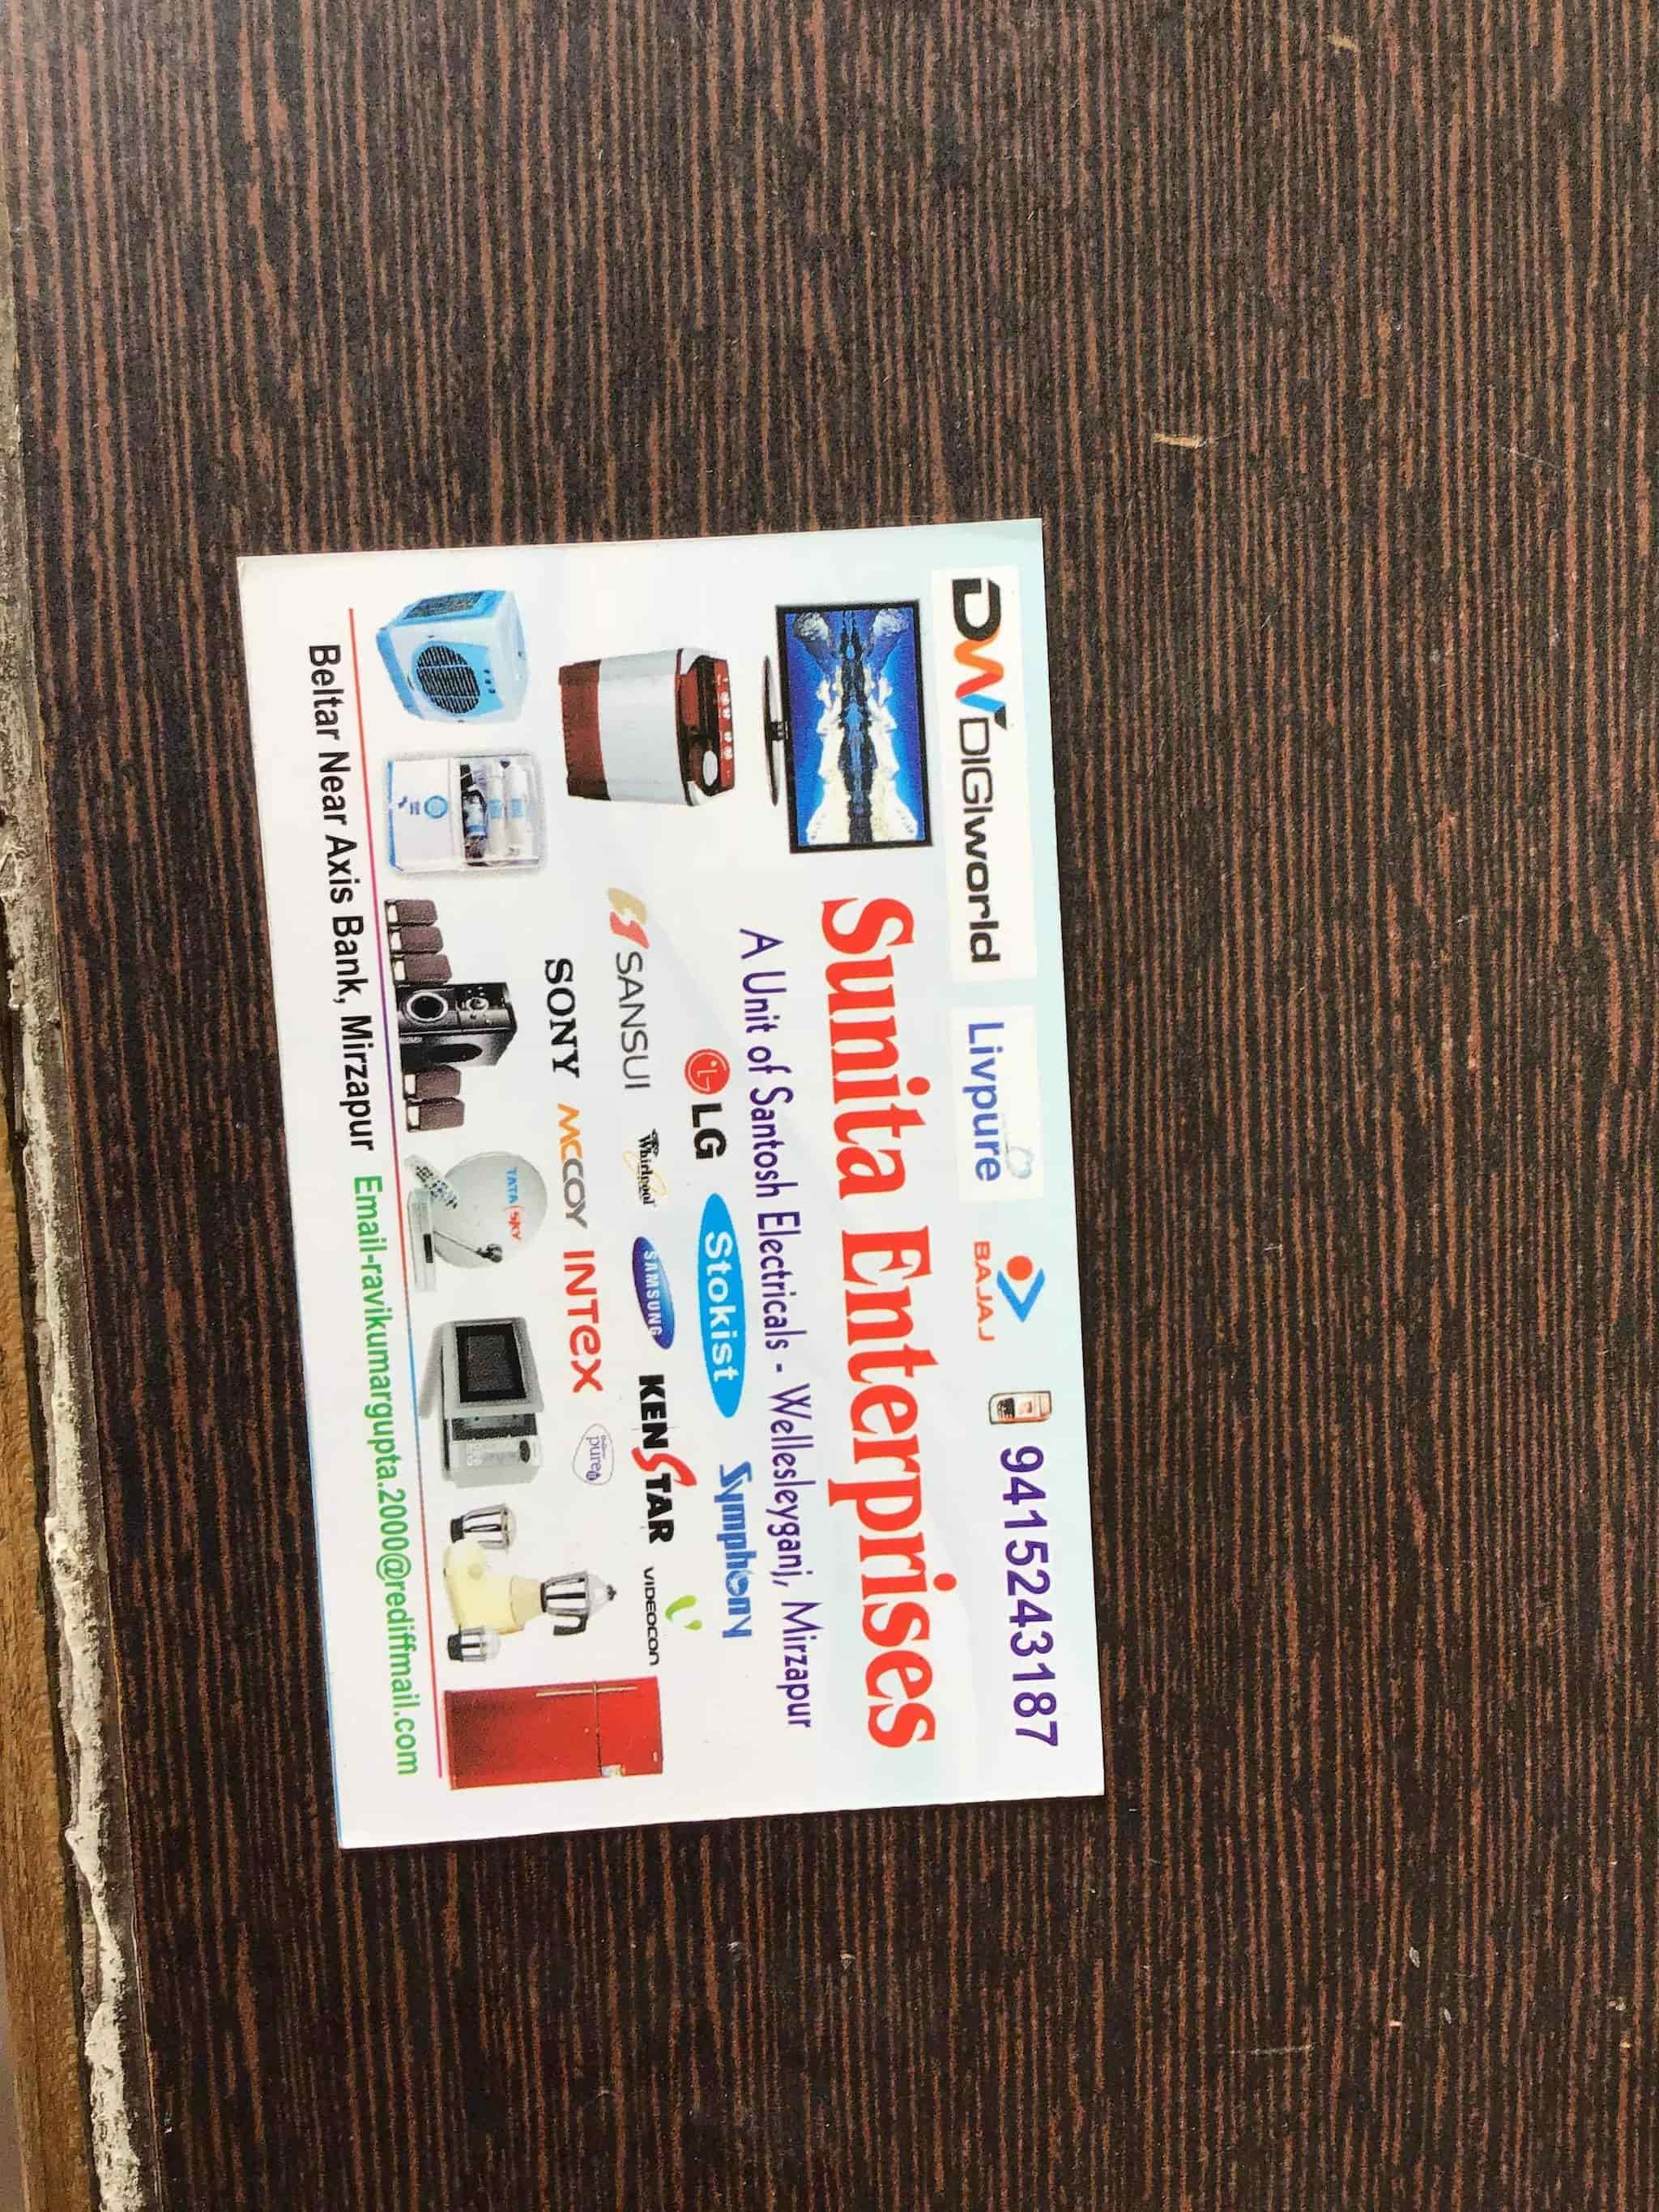 Sunita Enterprises, Mirzapur City - Electronic Goods Showrooms in